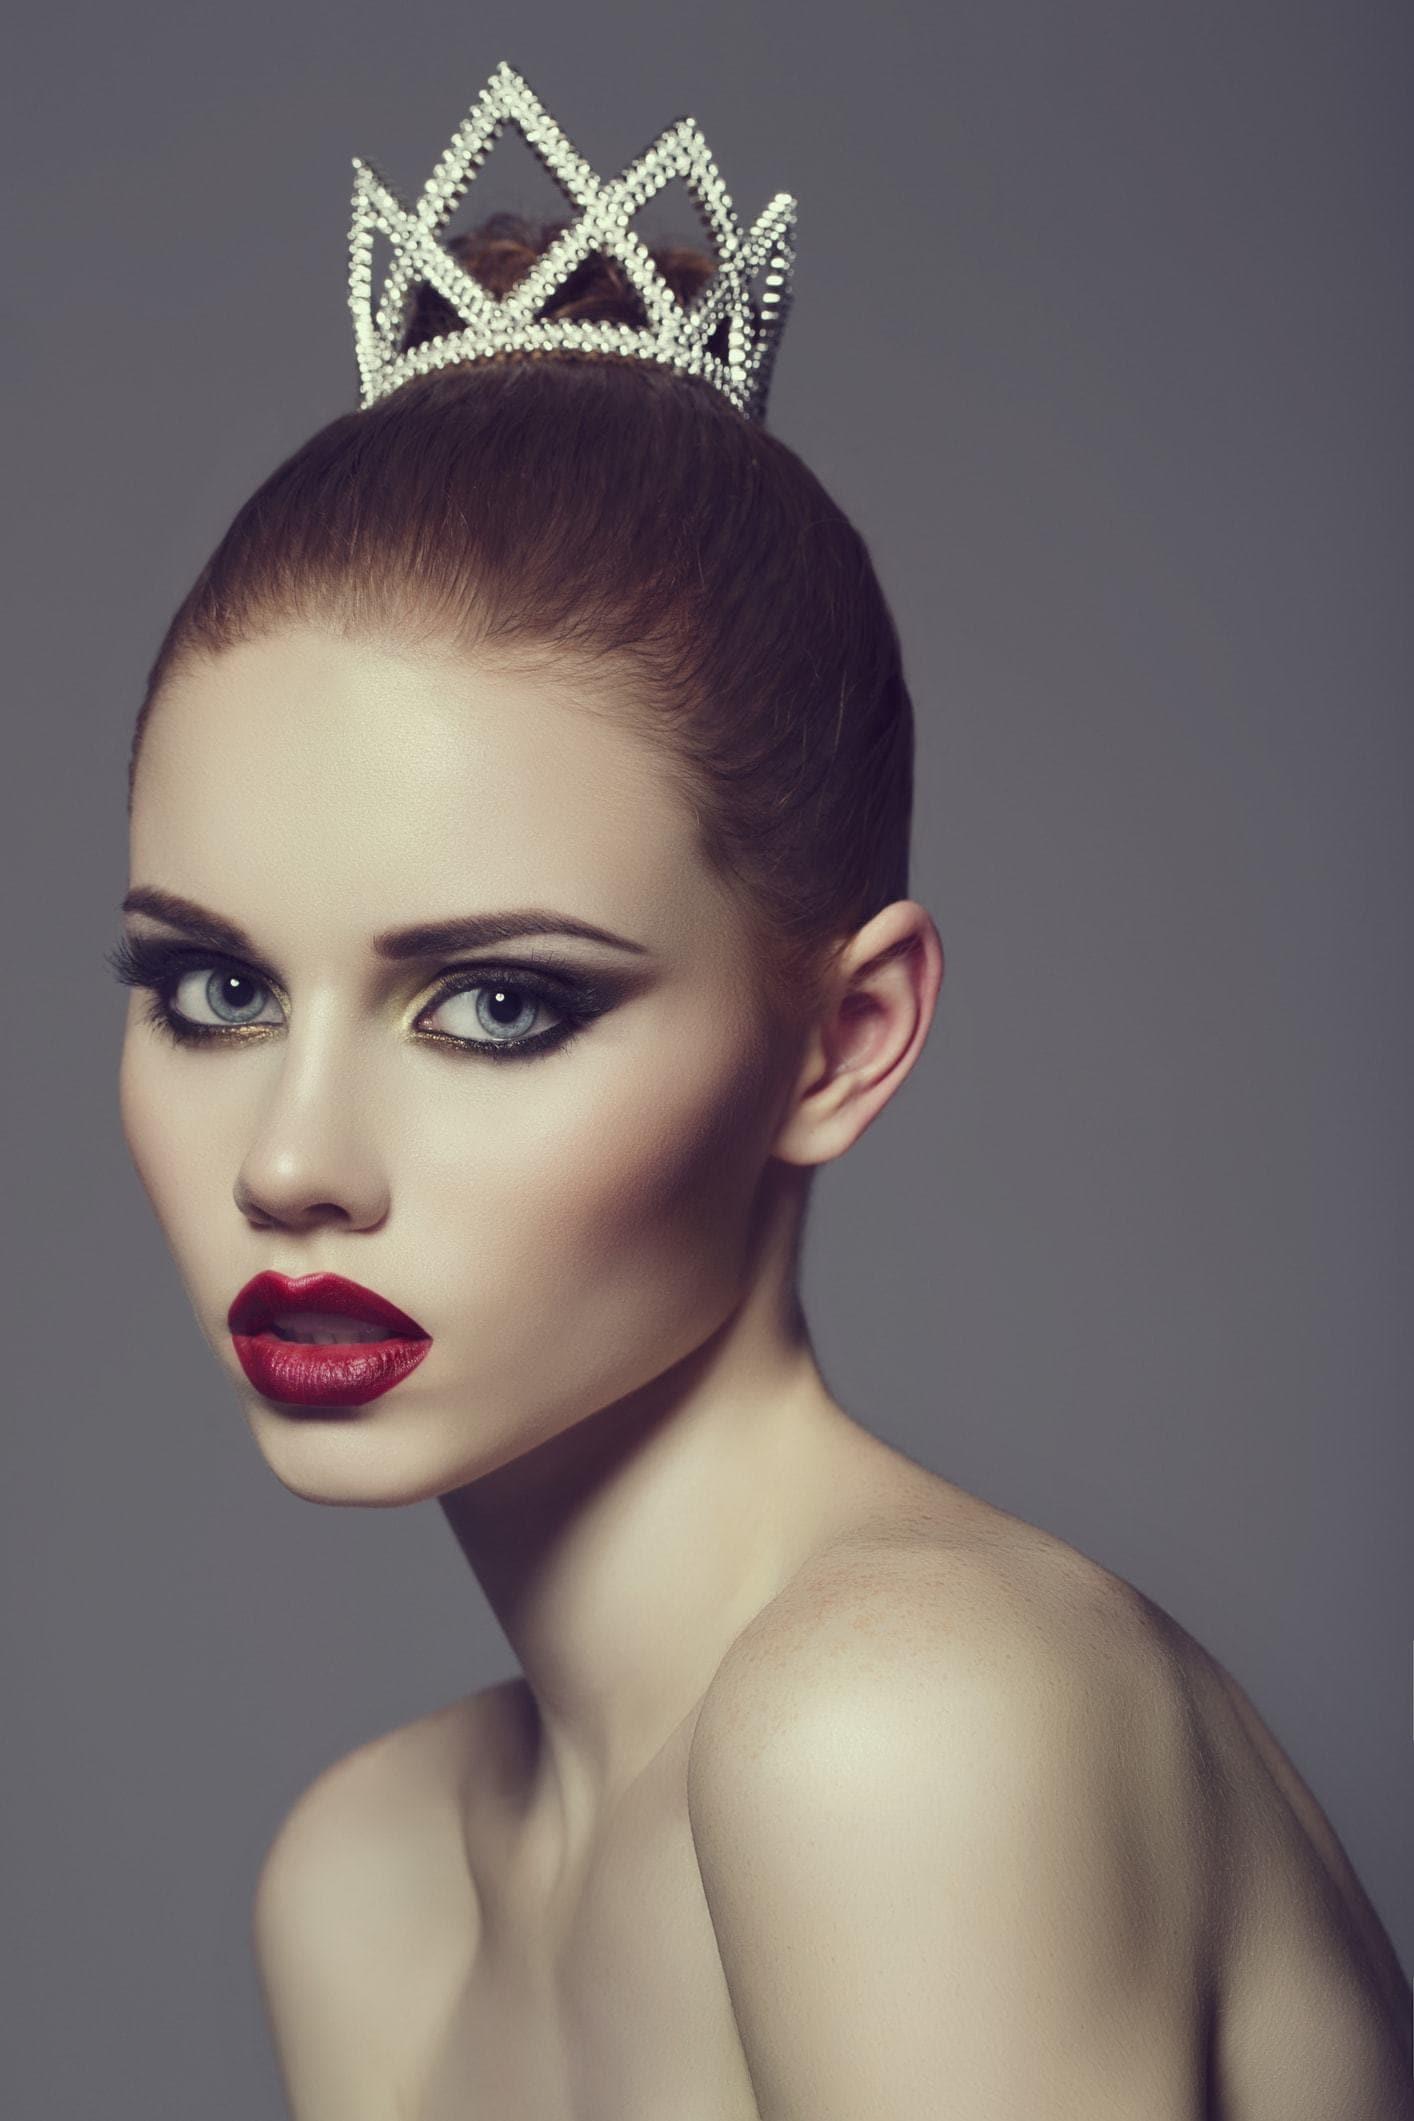 hairstyles with tiara braided bun small crown